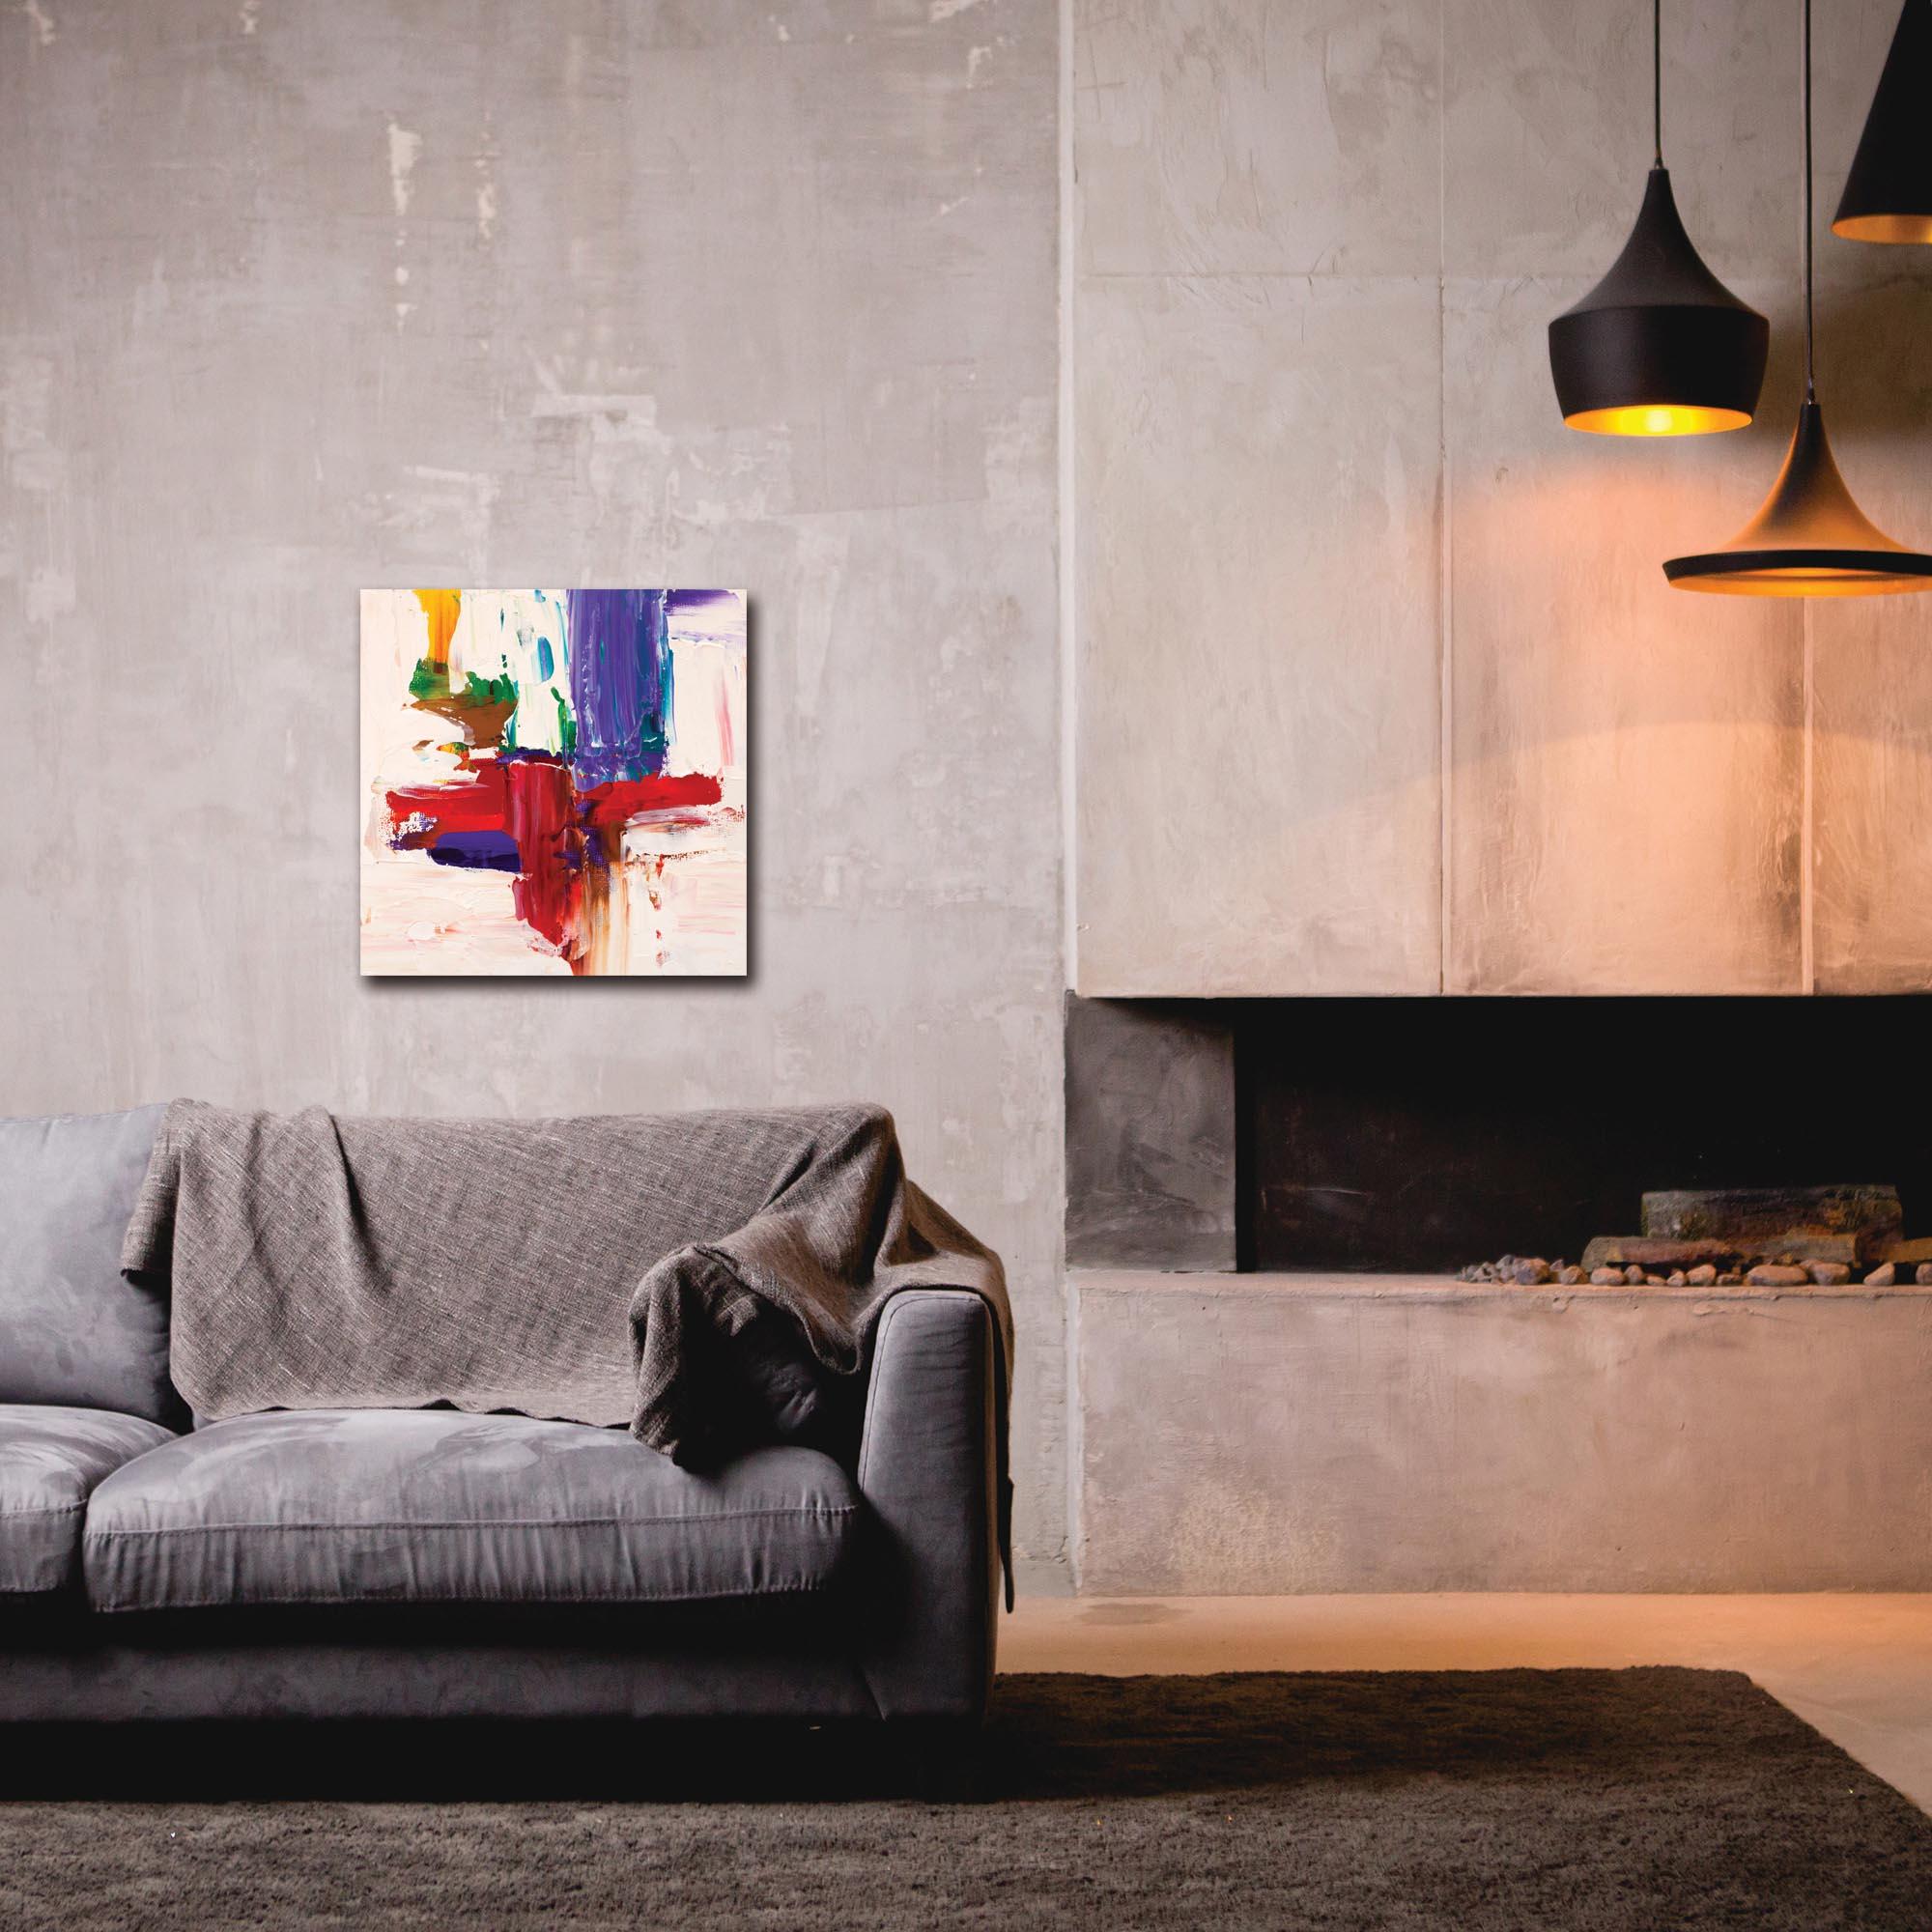 Abstract Wall Art 'Urban Life 10' - Urban Decor on Metal or Plexiglass - Lifestyle View